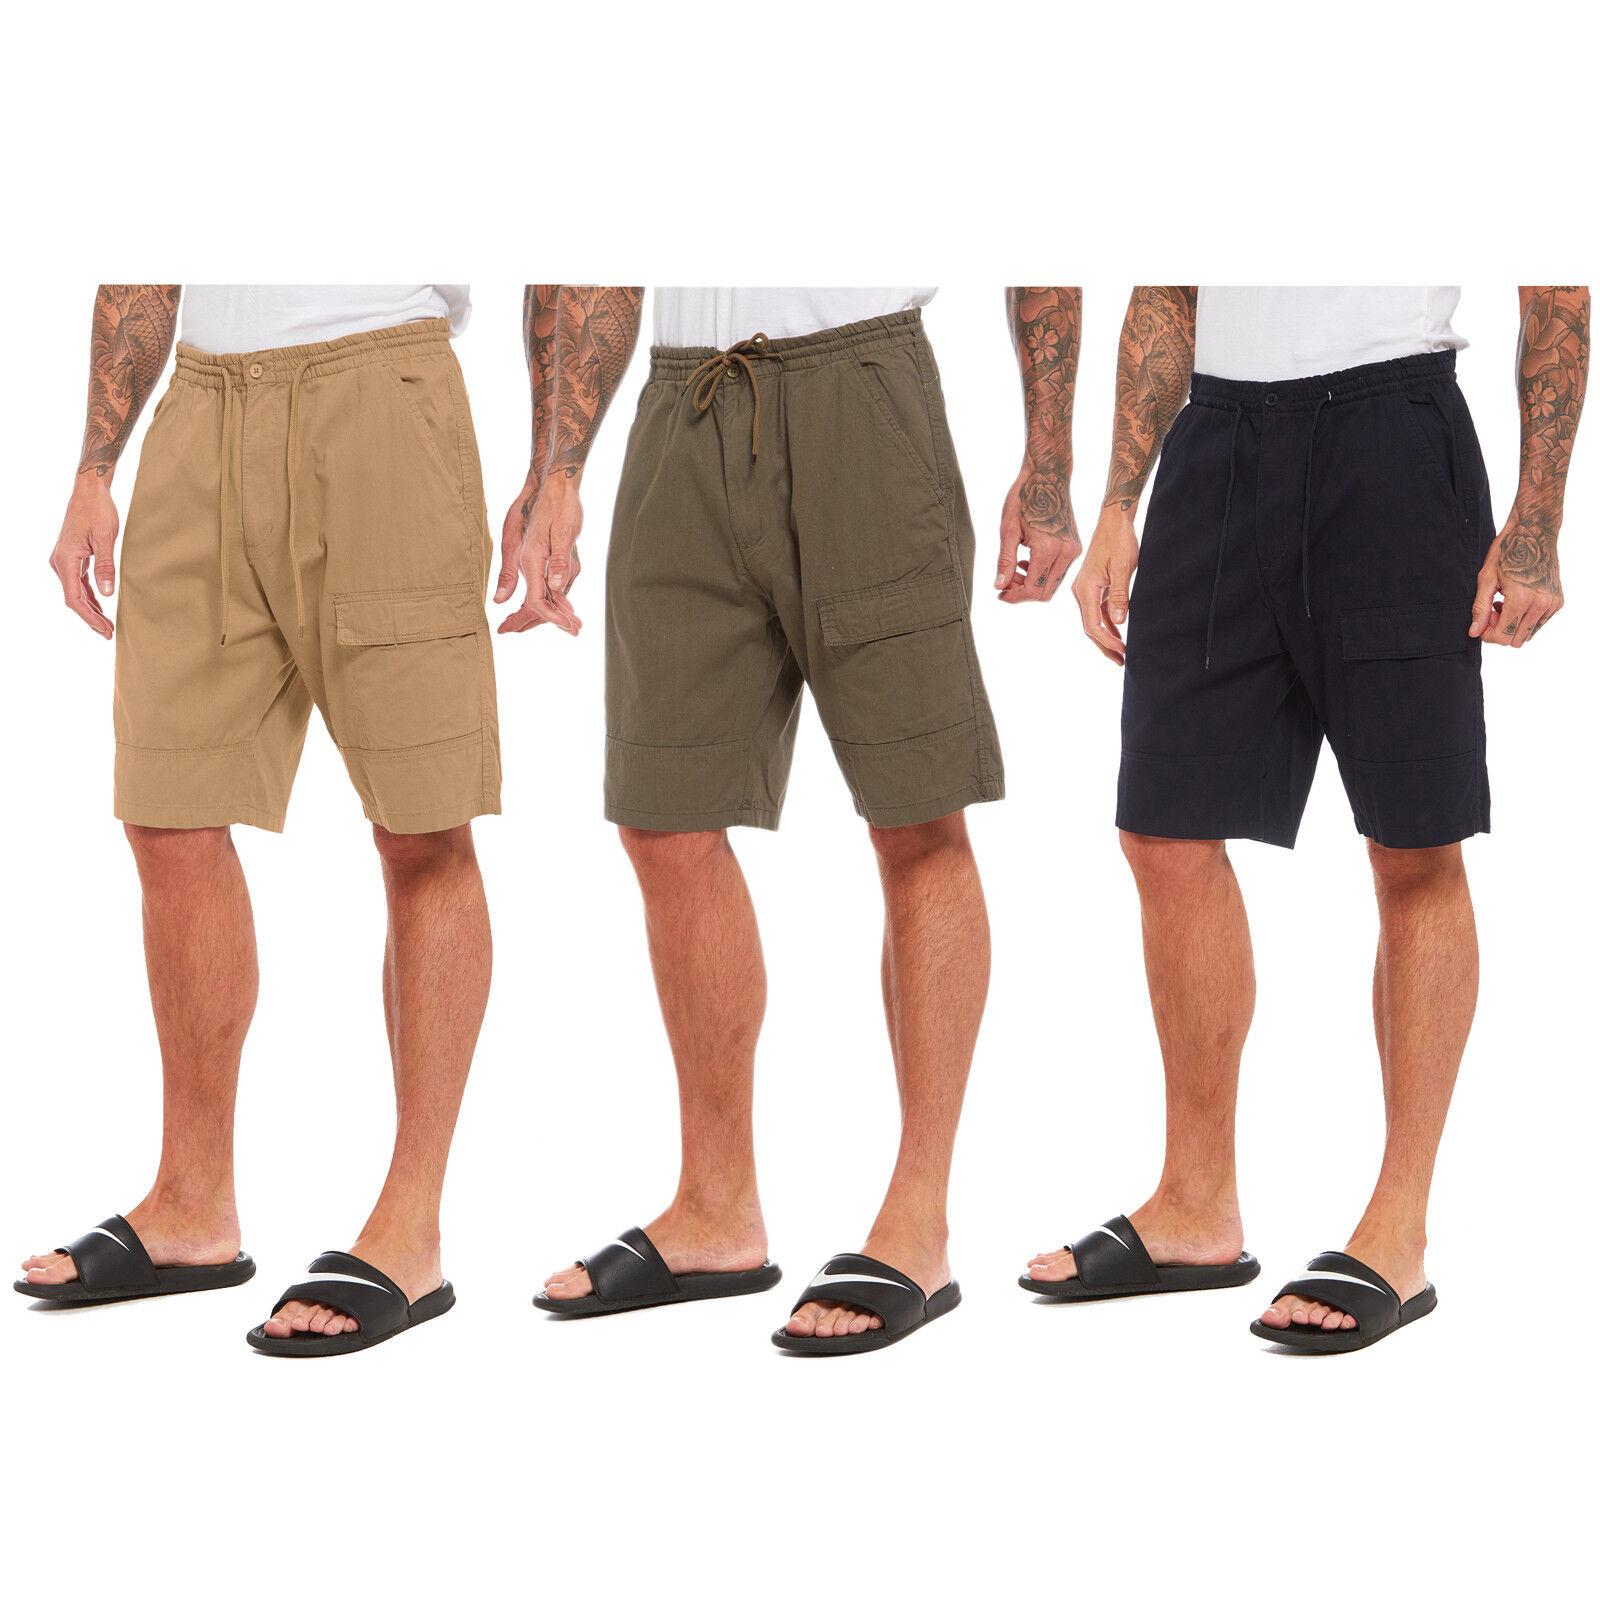 NEW MENS PLAIN SHORTS CARGO COMBAT CASUAL SUMMER BEACH POLY COTTON POCKETS PANTS